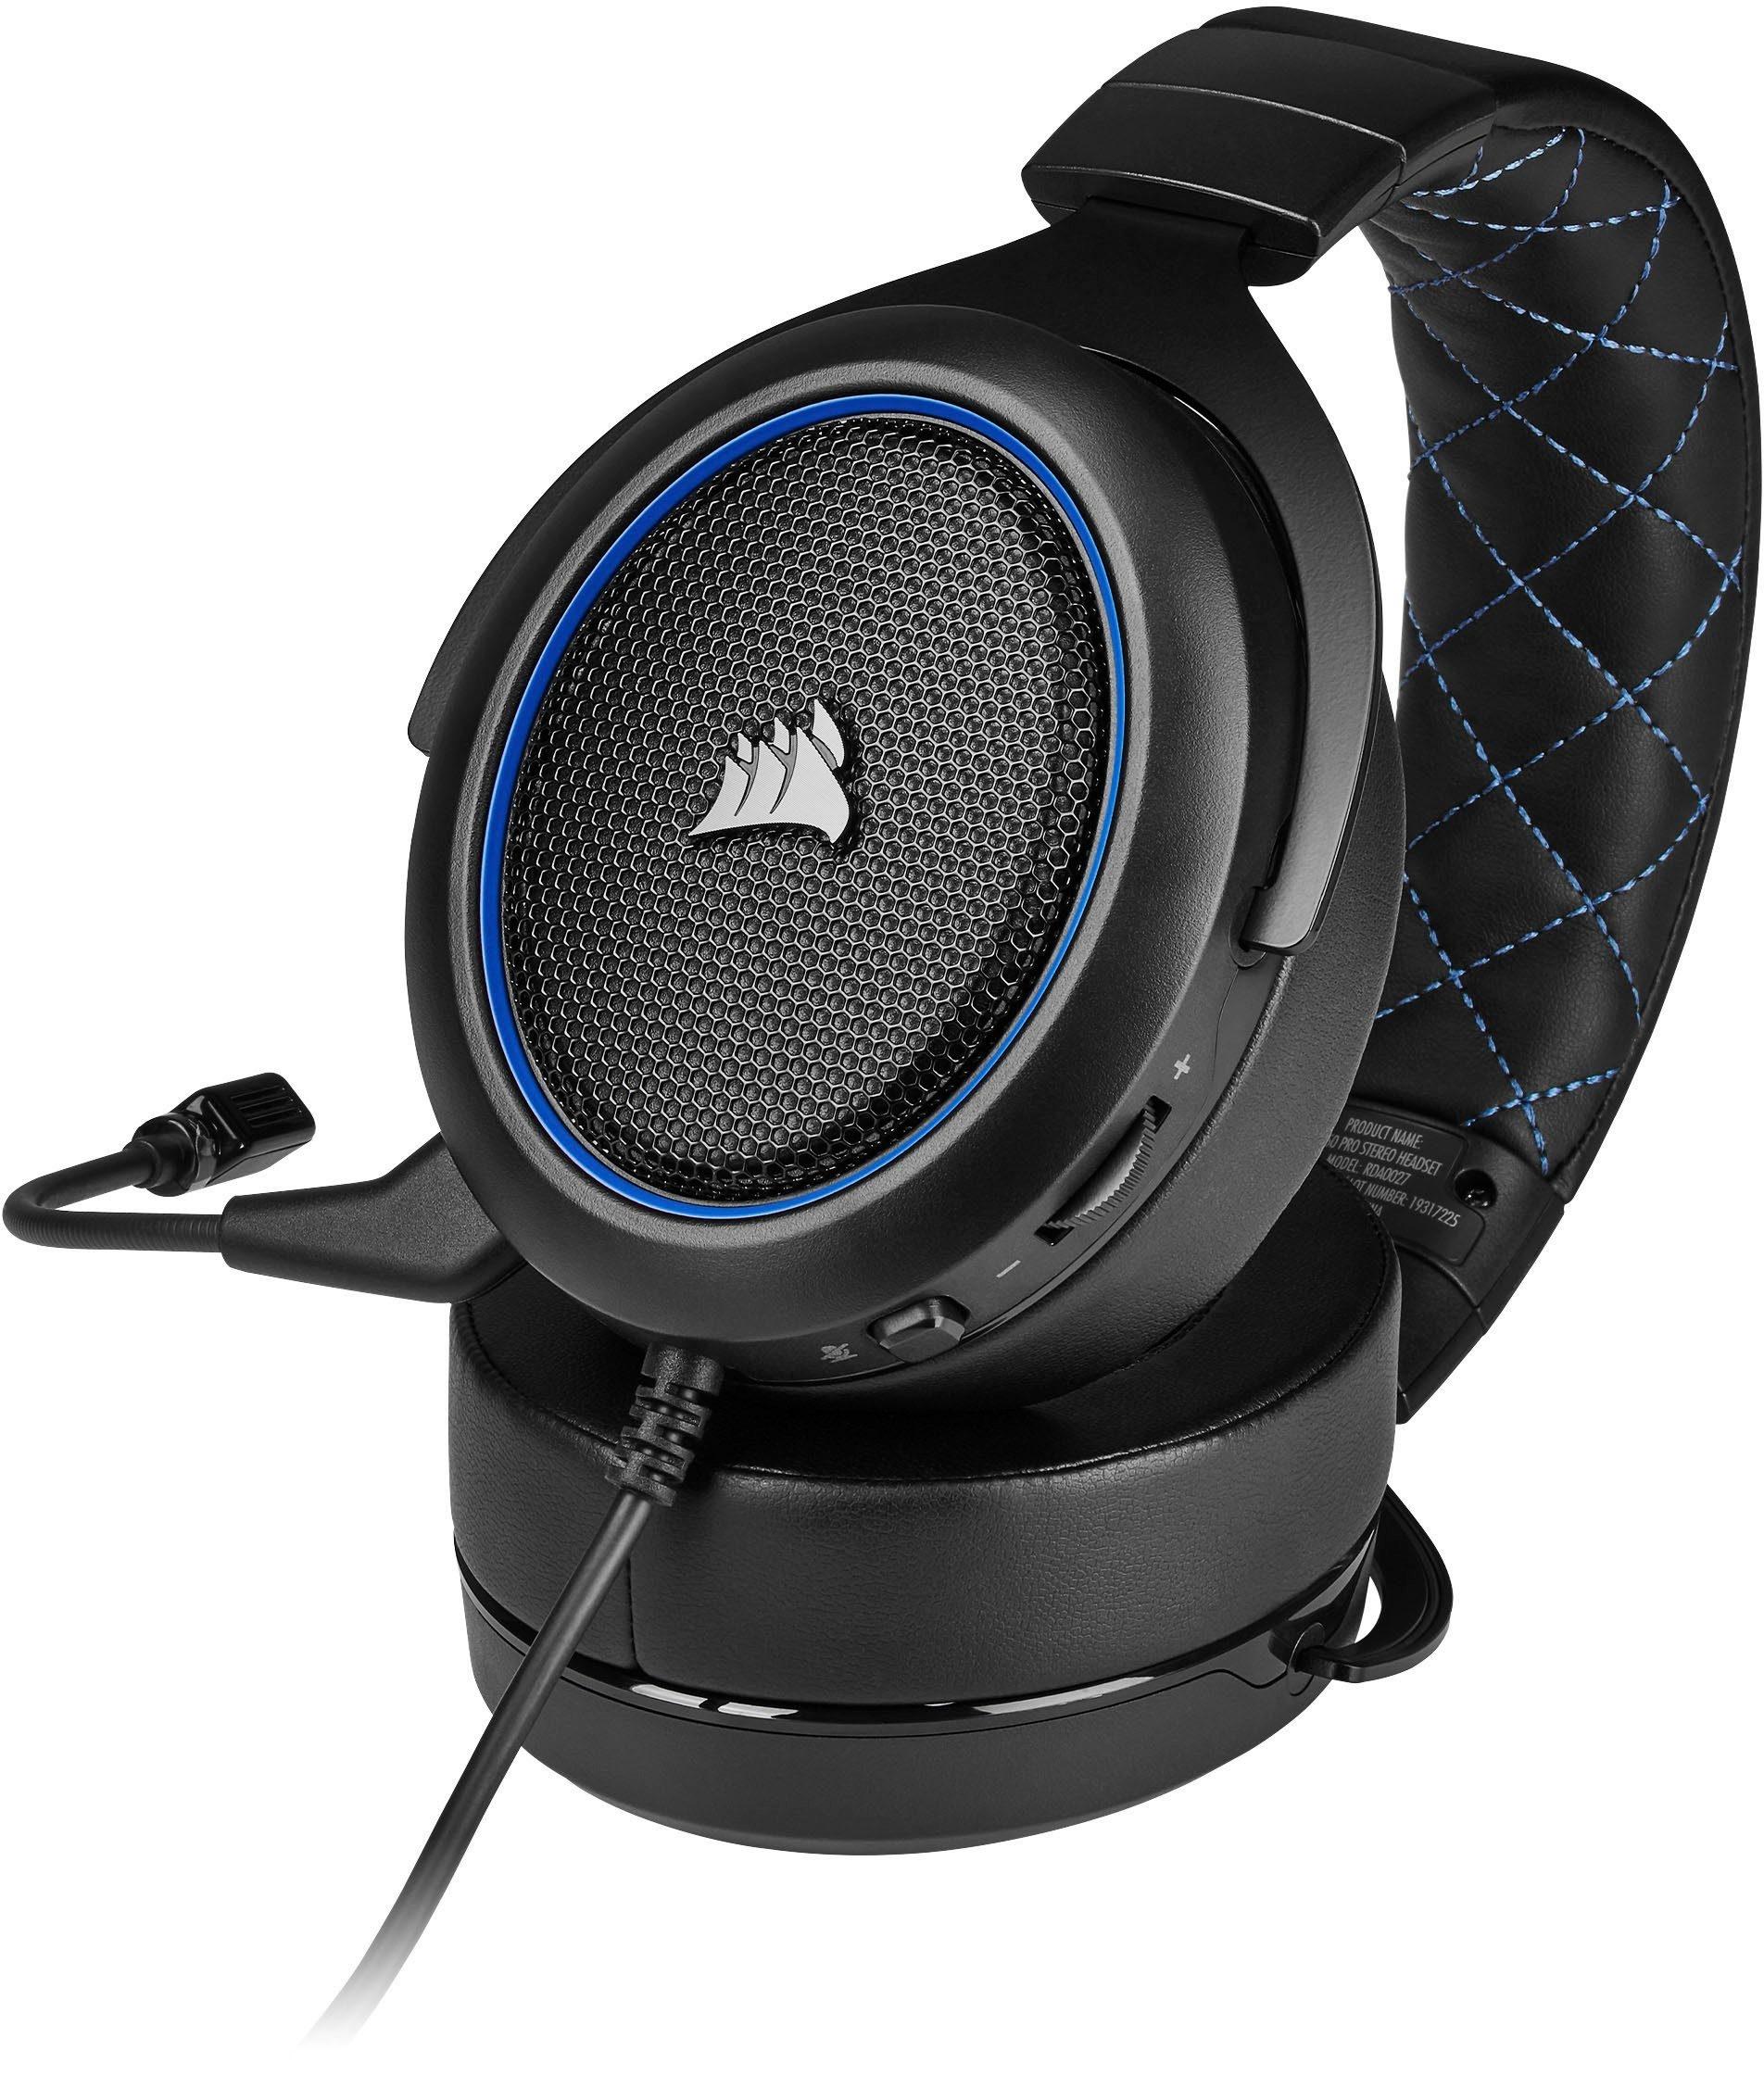 Corsair HS50 Pro Gaming Headset Schwarz Blau Kopfbügelhörer Kabelgebunden Stereo